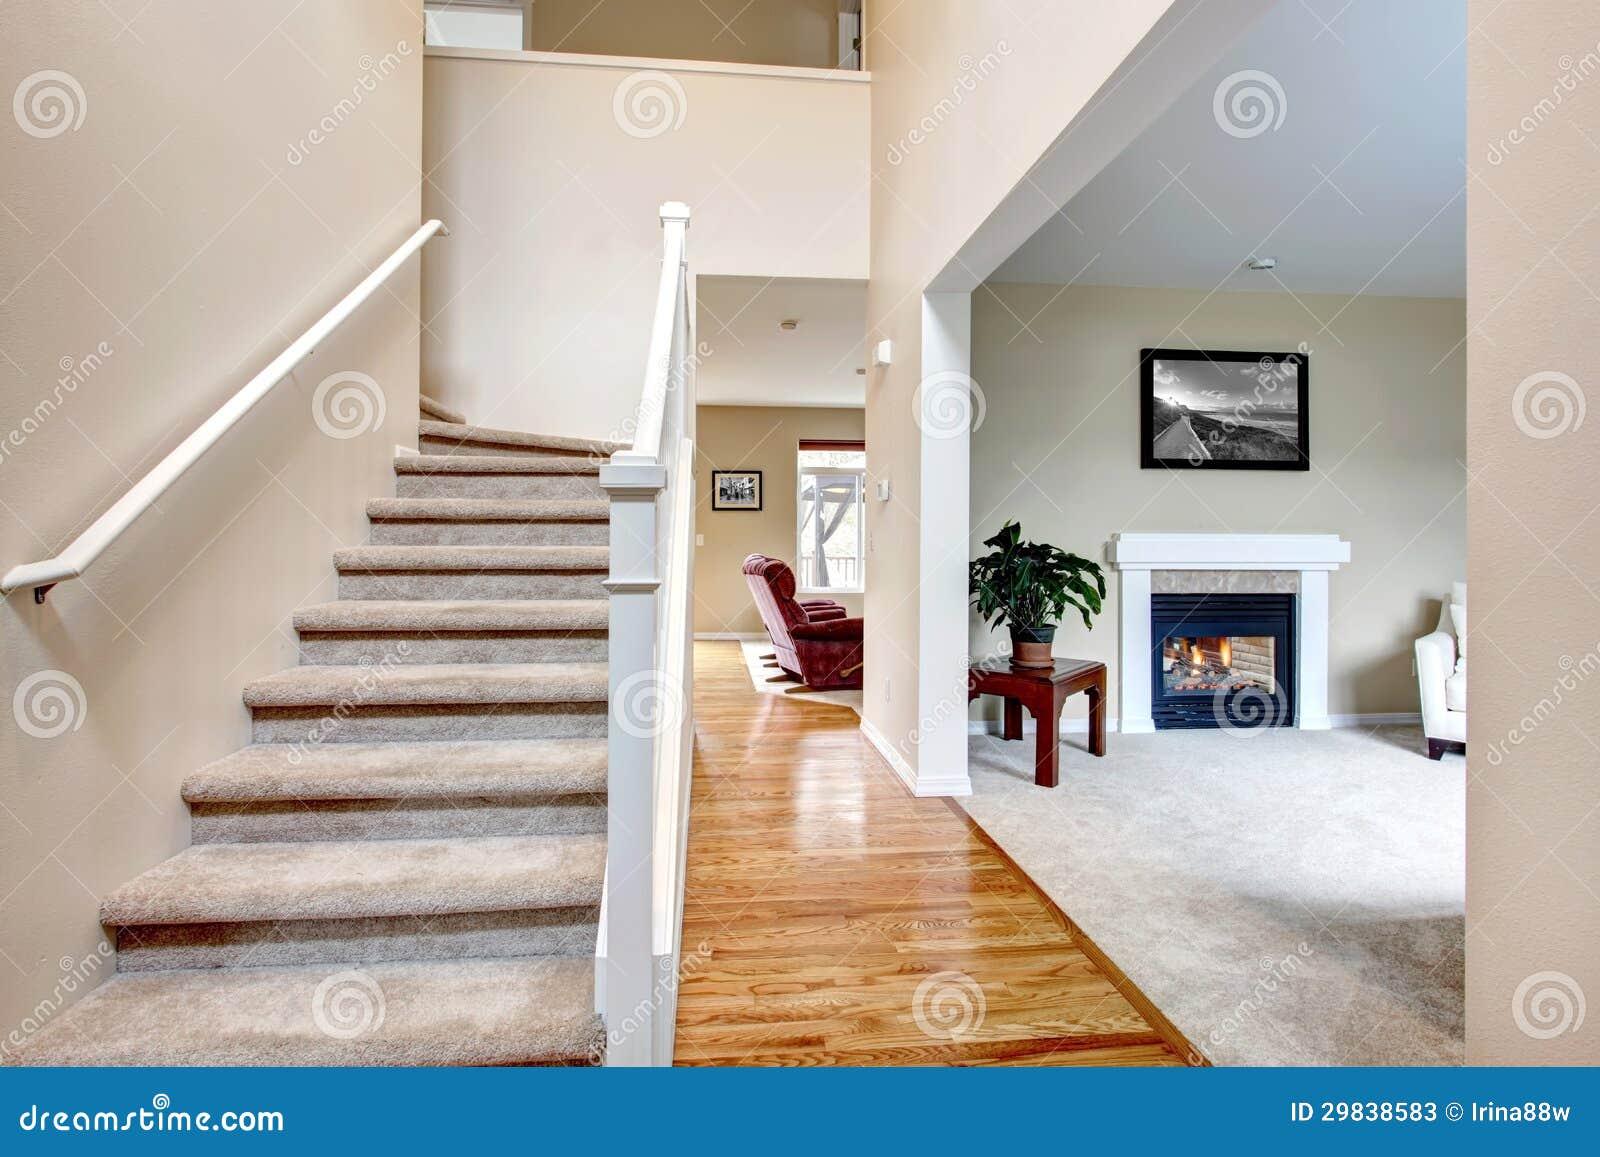 Klassiek huisbinnenland met woonkamer en trap stock afbeelding